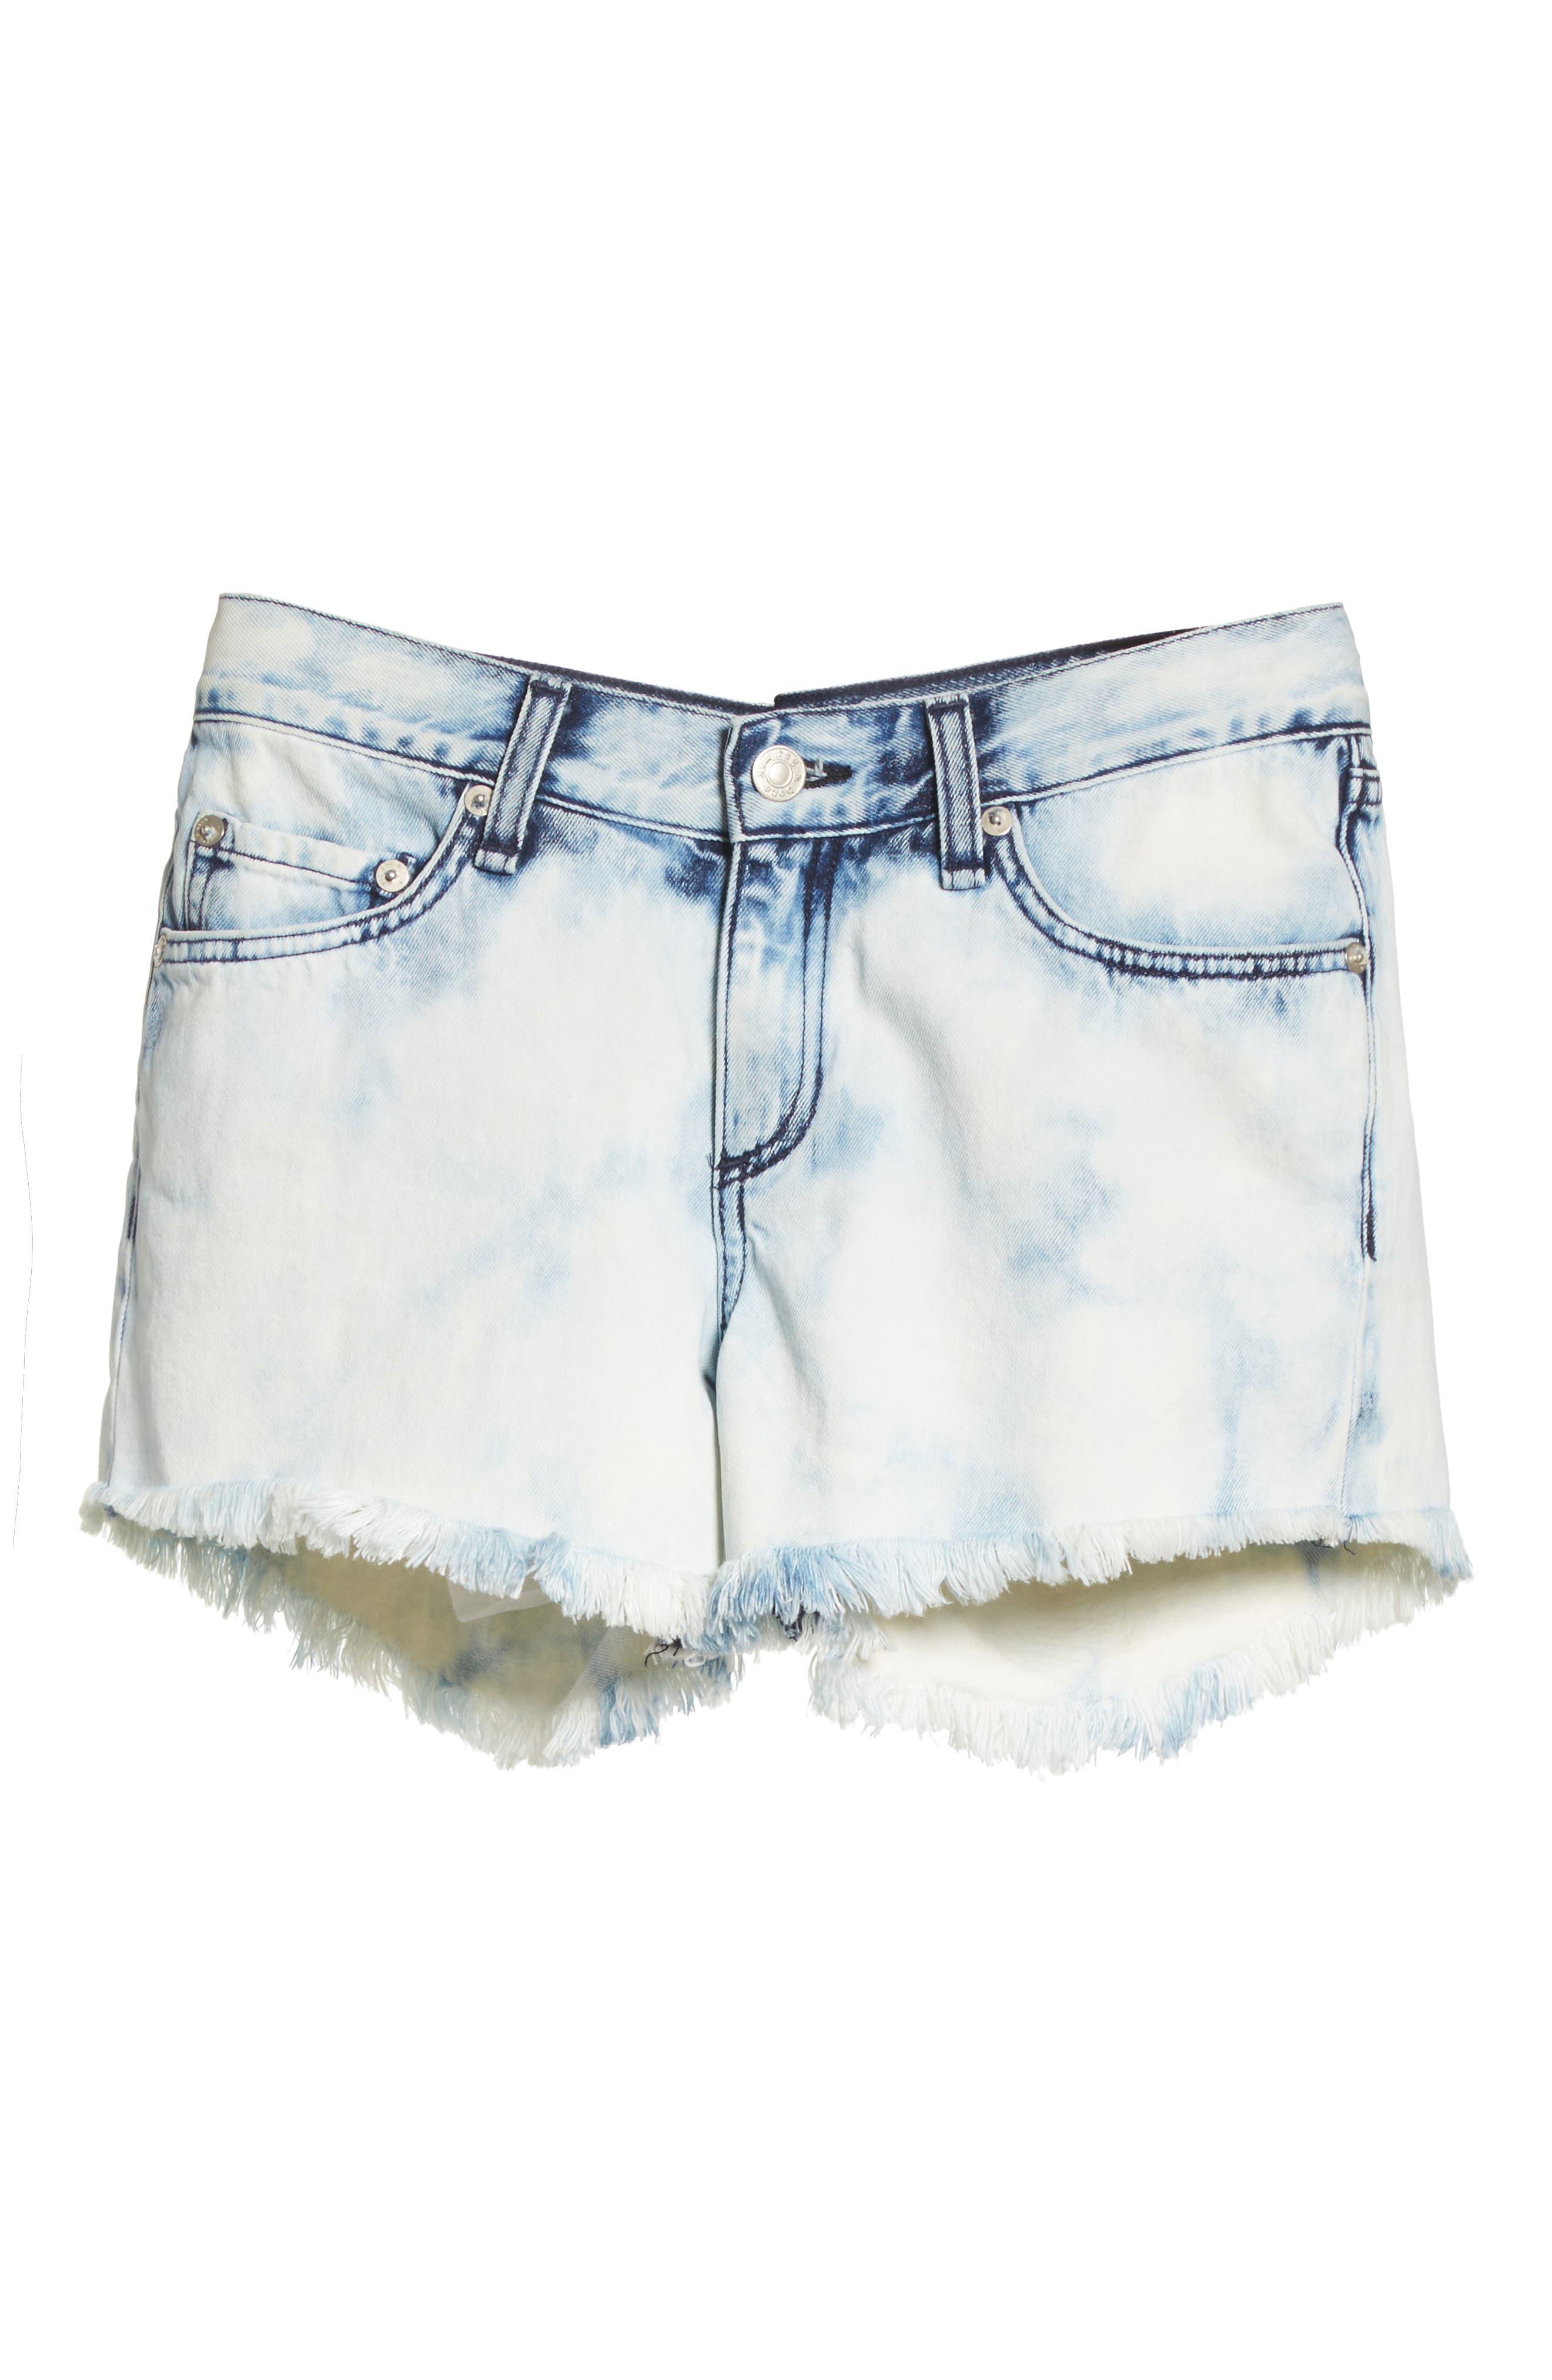 Cutoff Denim Shorts,                             Alternate thumbnail 6, color,                             490